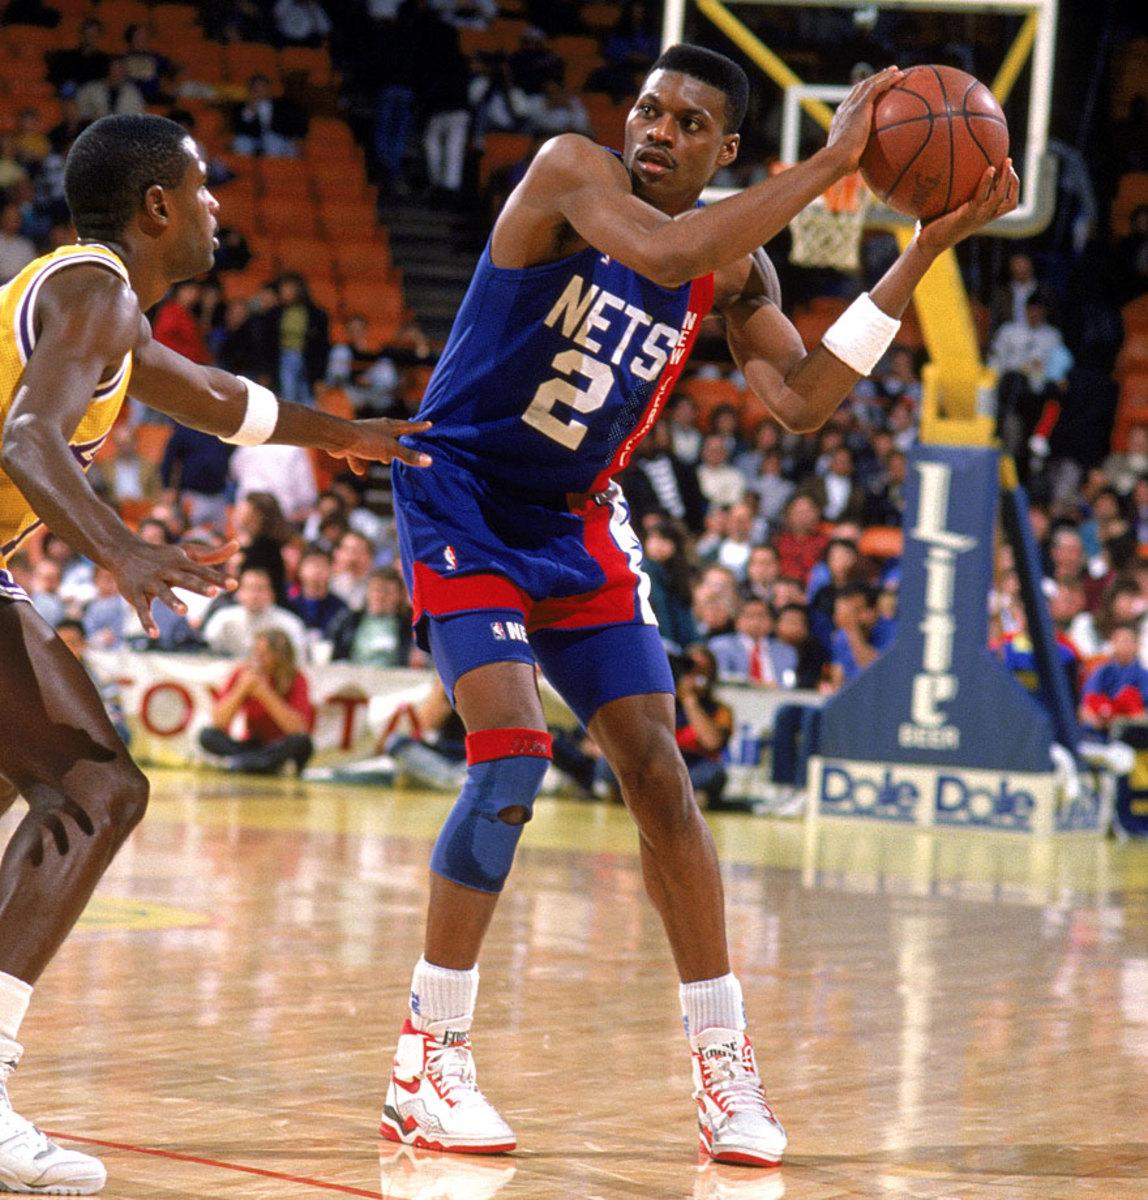 1987-nba-draft-pick-dennis-hopson.jpg